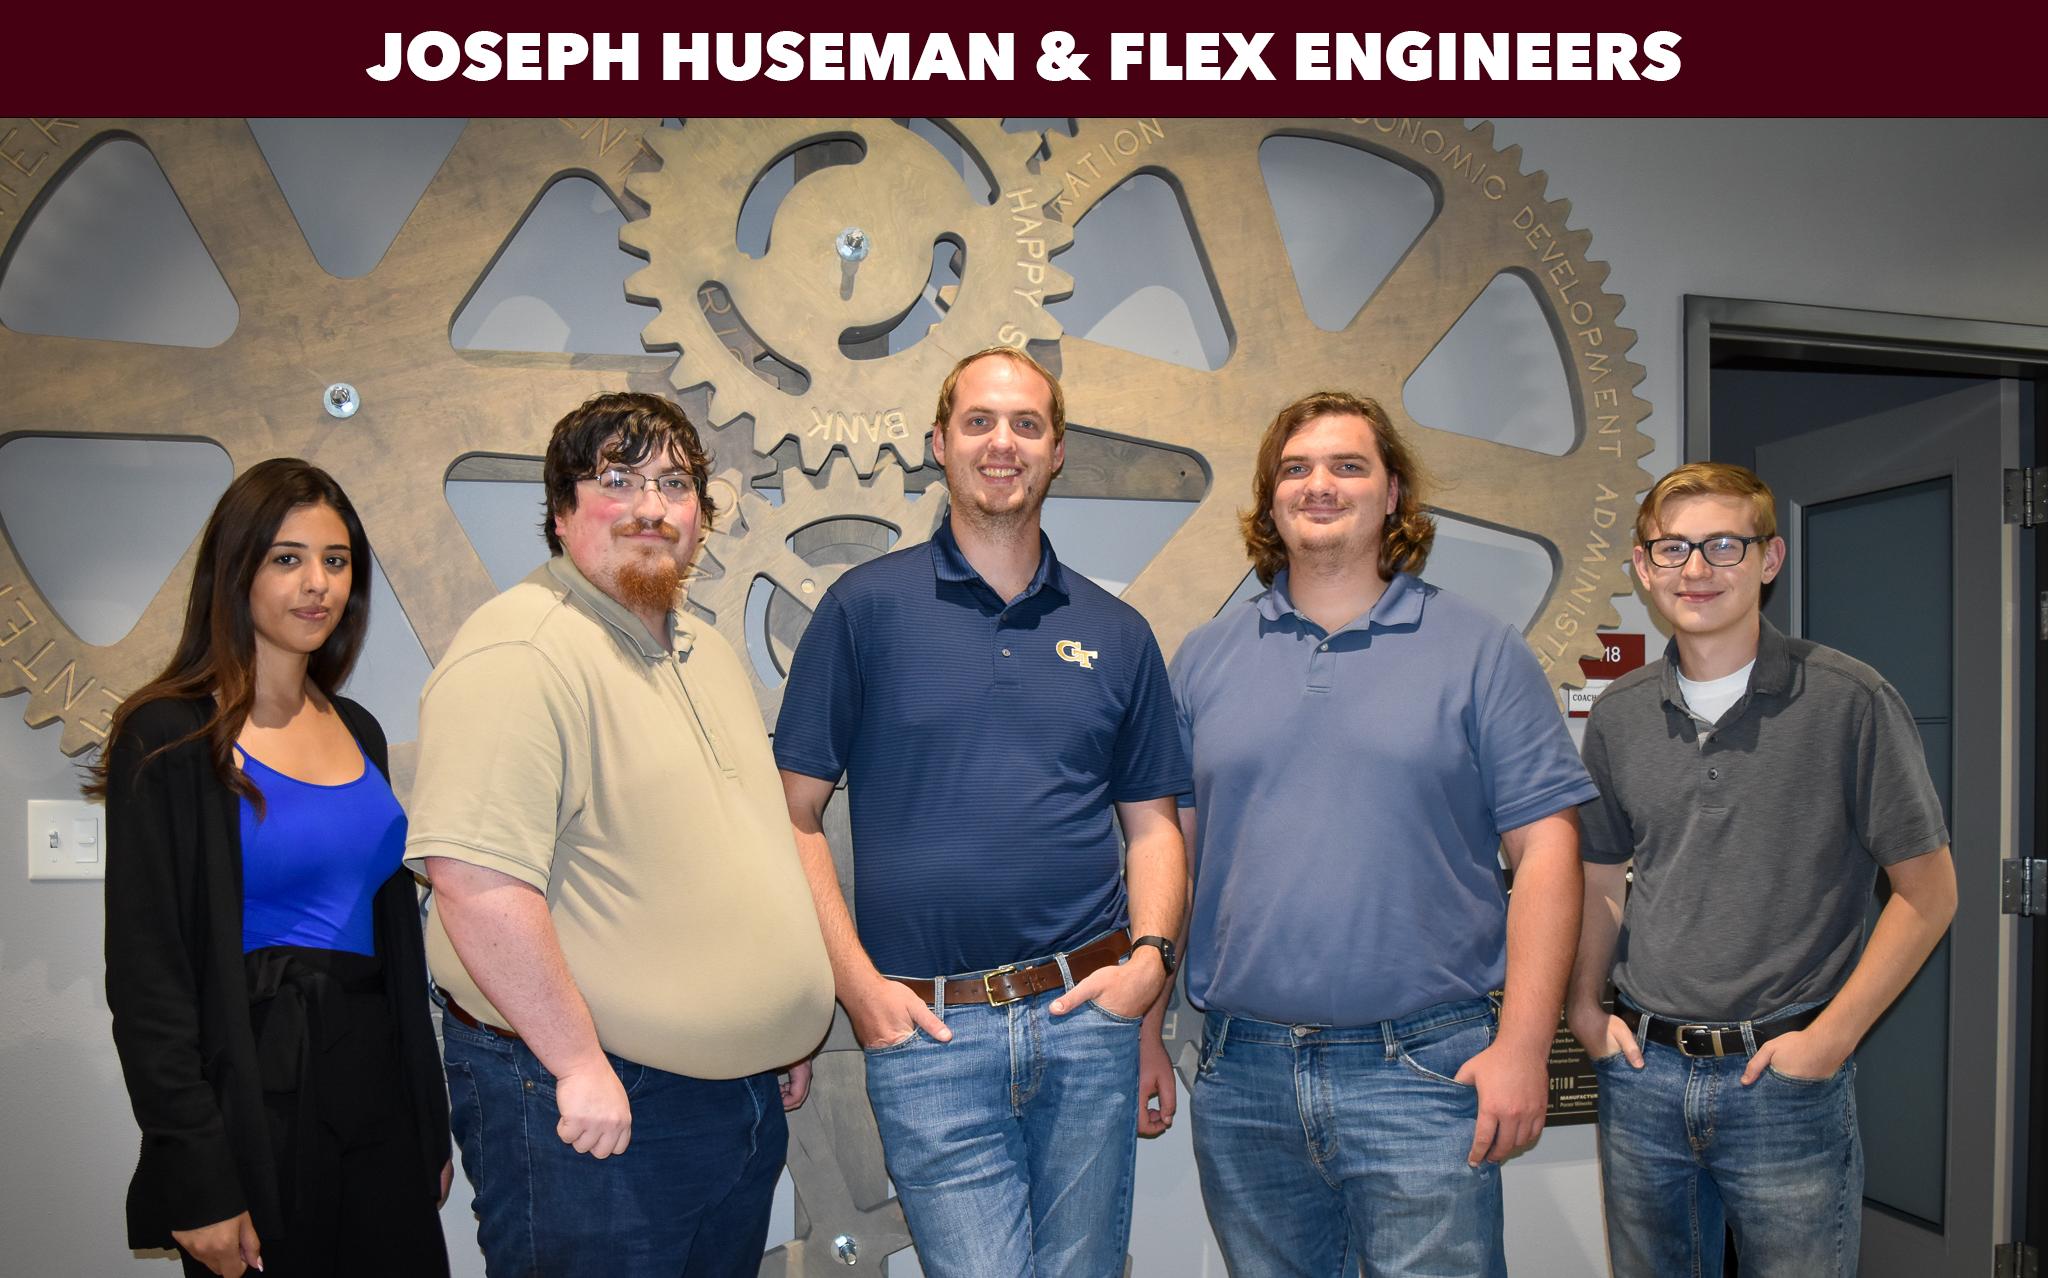 Joseph Huseman & FLEX Engineers